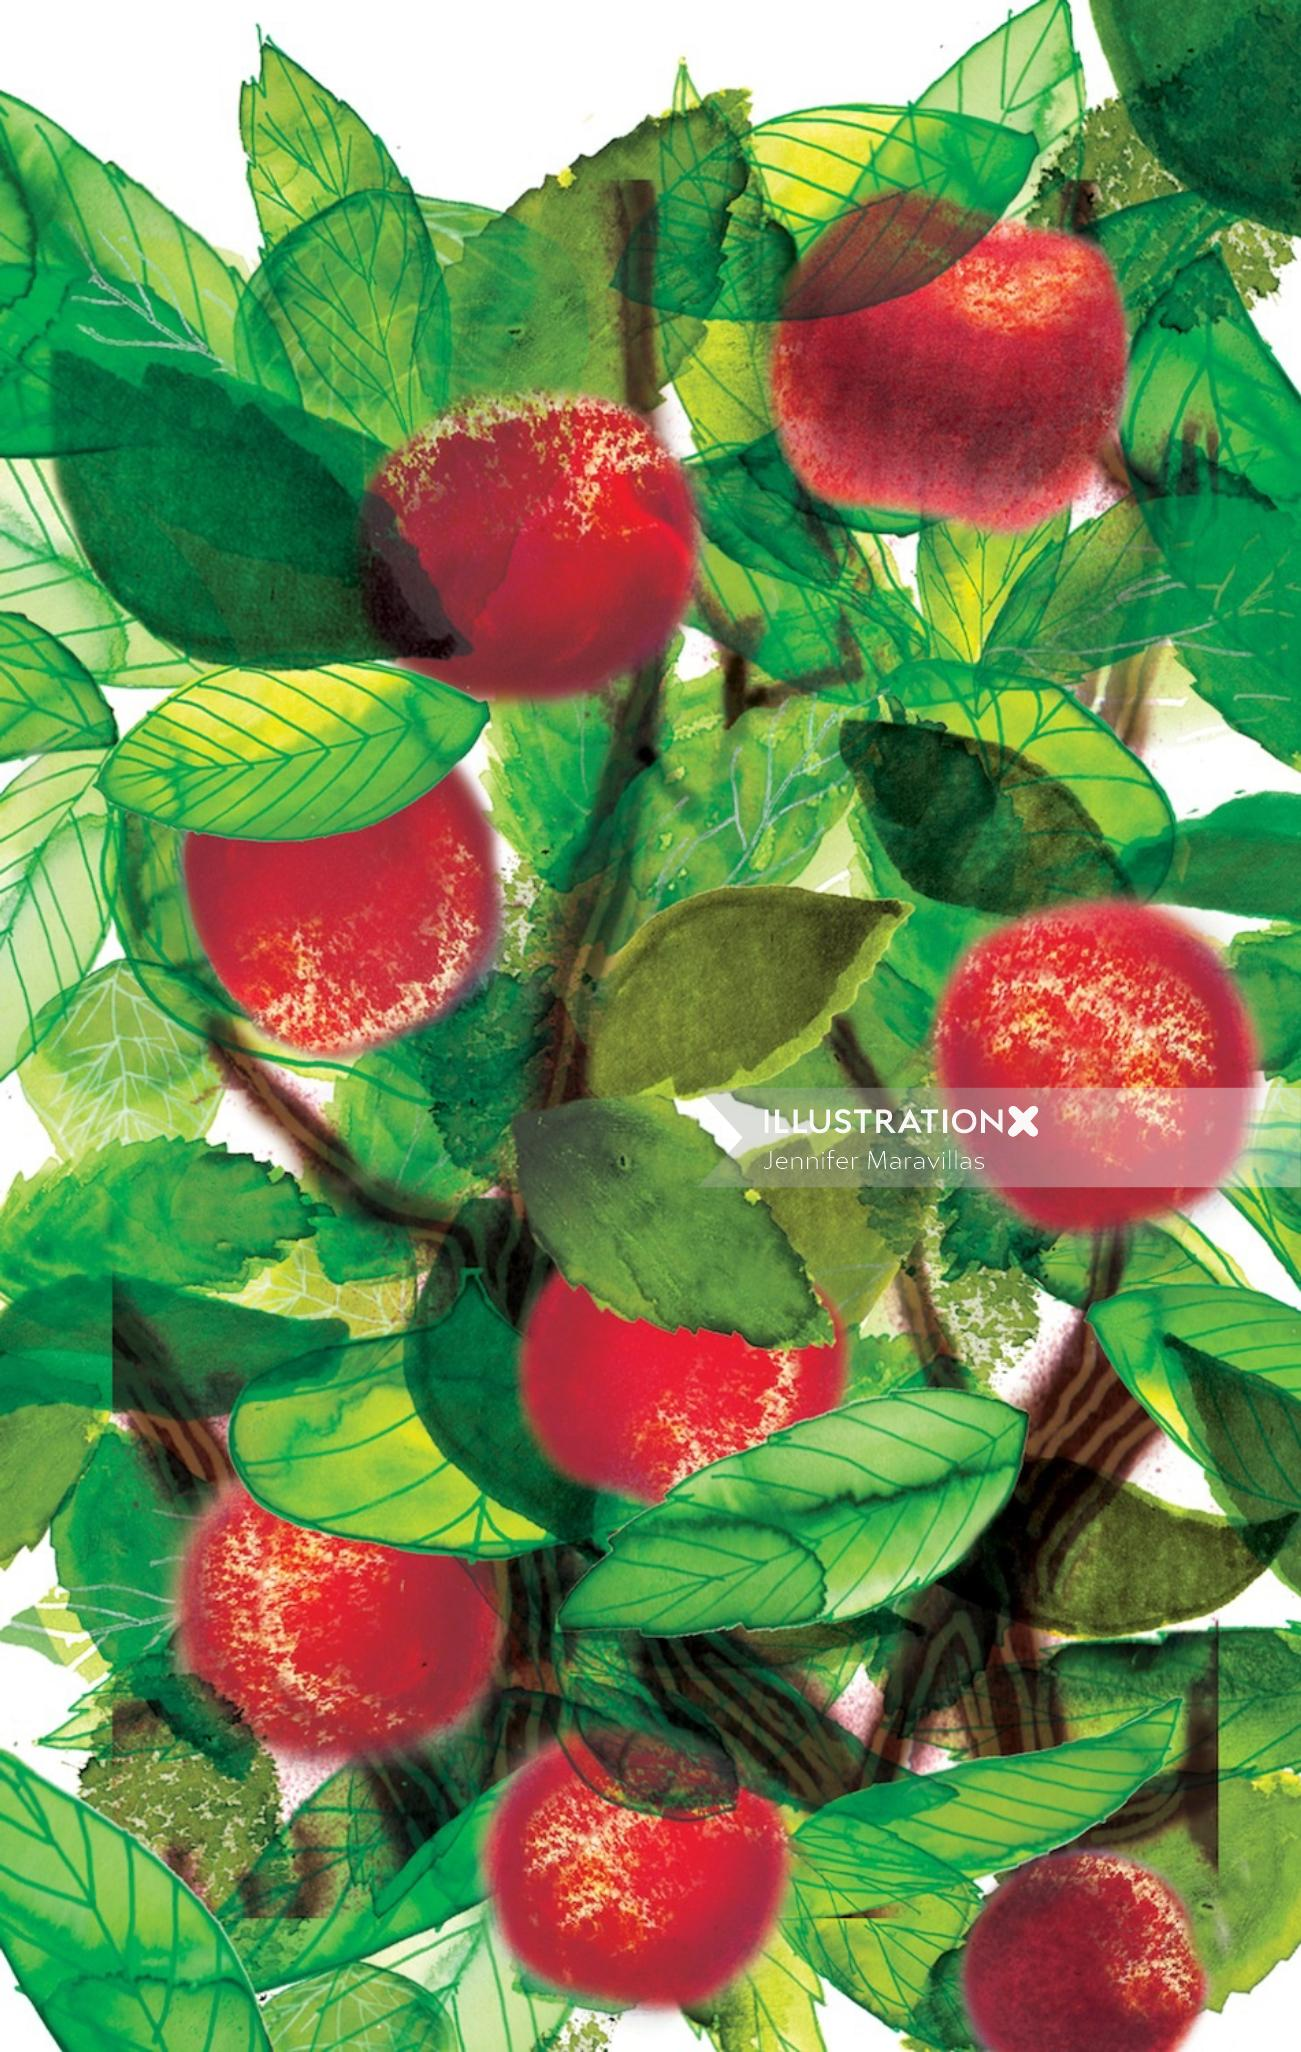 Cherry illustration by Jennifer Maravillas